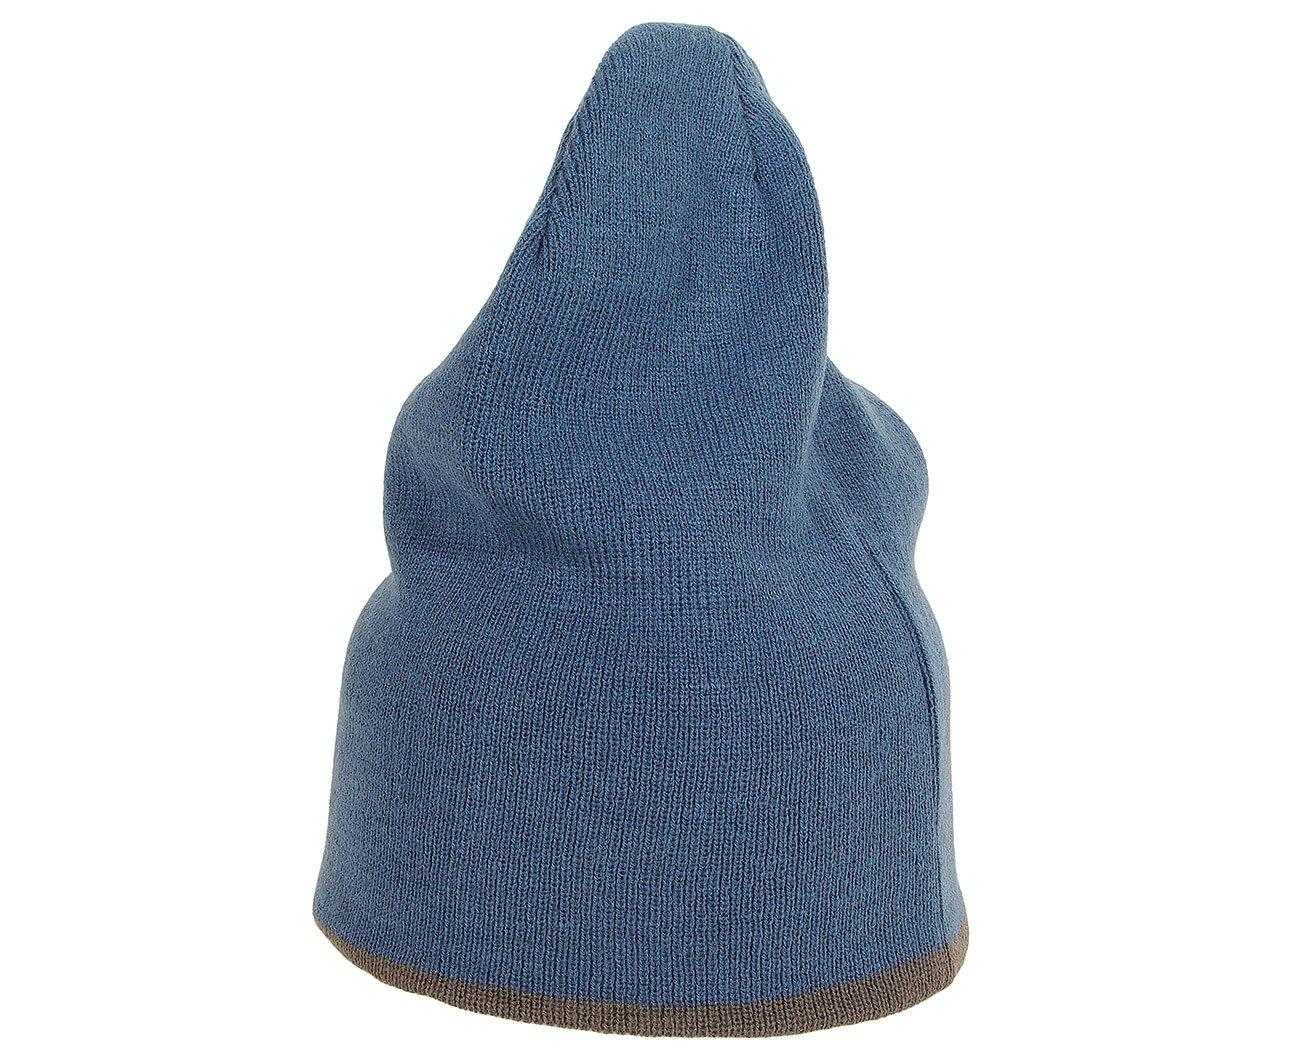 Mess 2355 czapka reversibile 4 in 1 blu